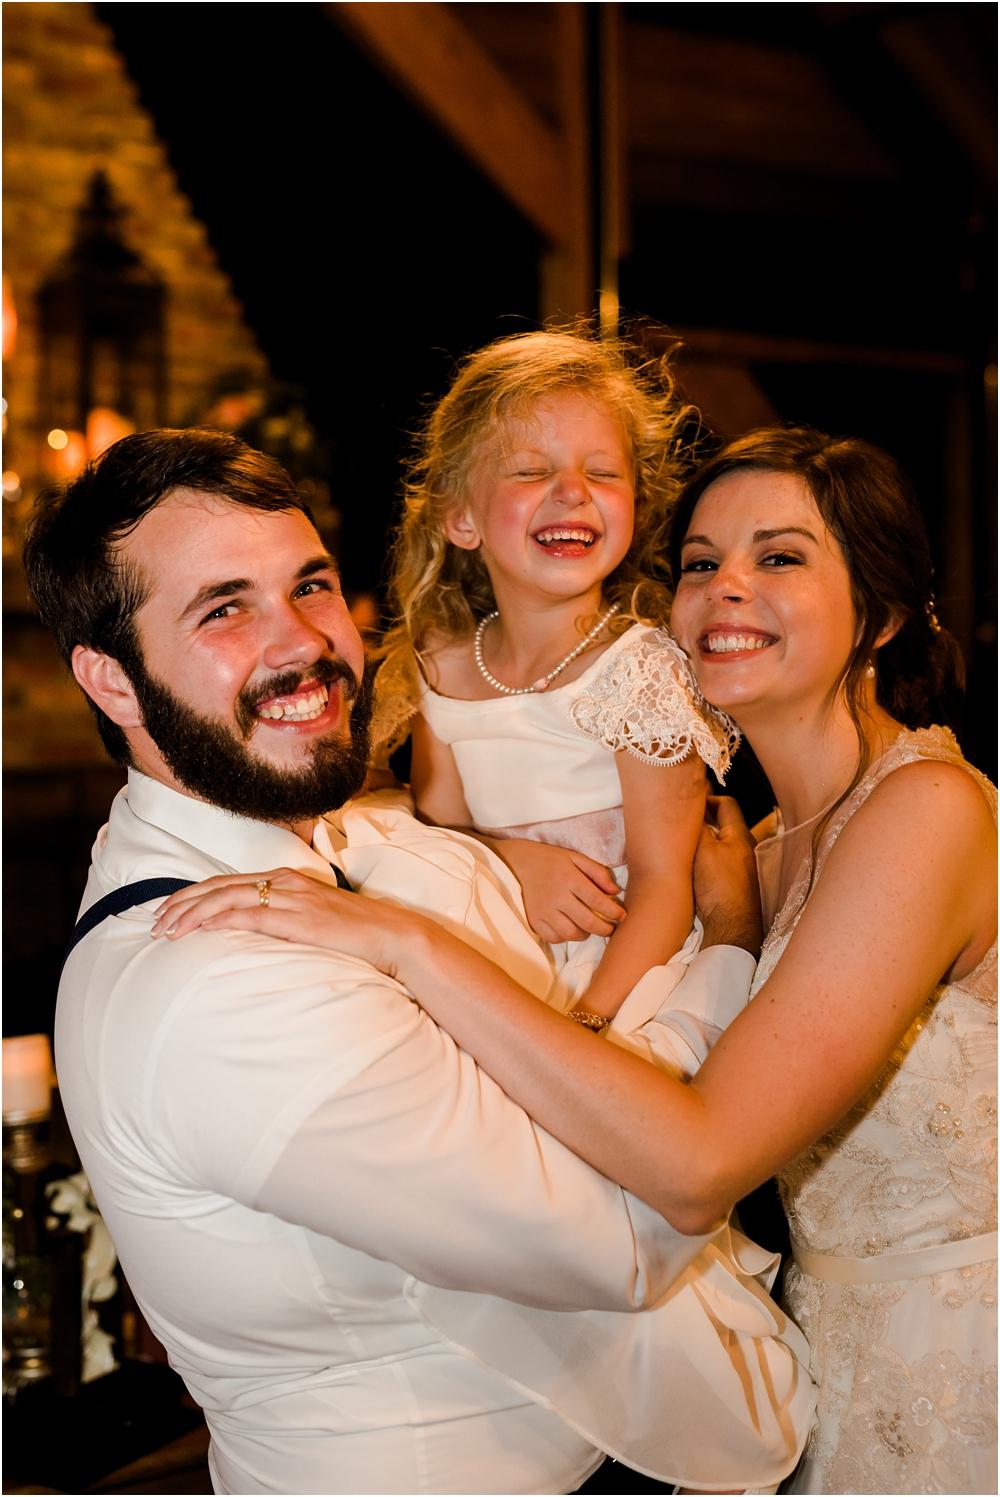 marianna-florida-wedding-photographer-kiersten-grant-213.jpg